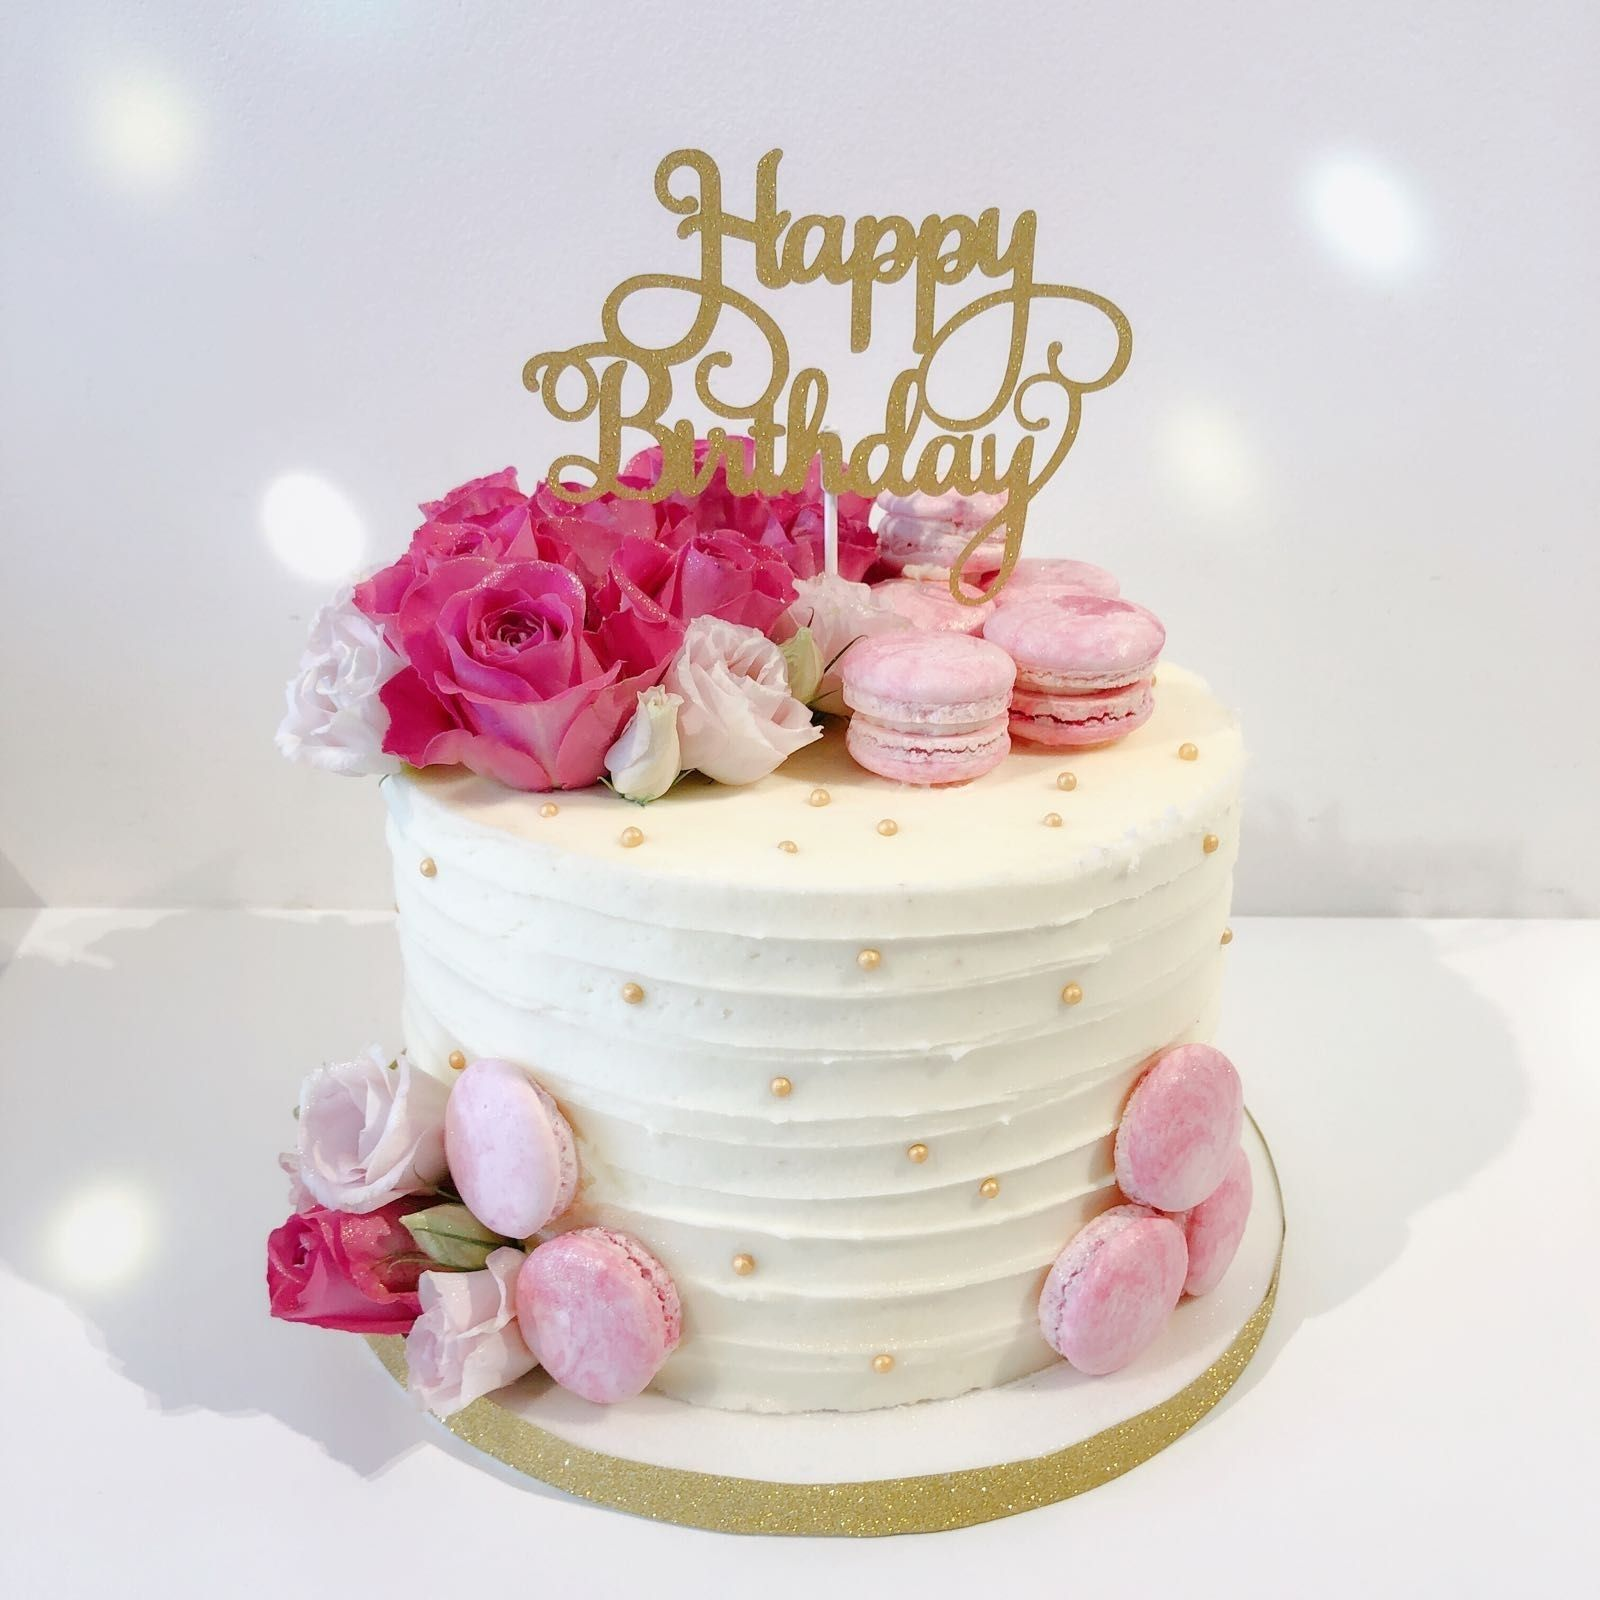 Happy Birthday Beautiful Cake For Birthday Ideas In 2020